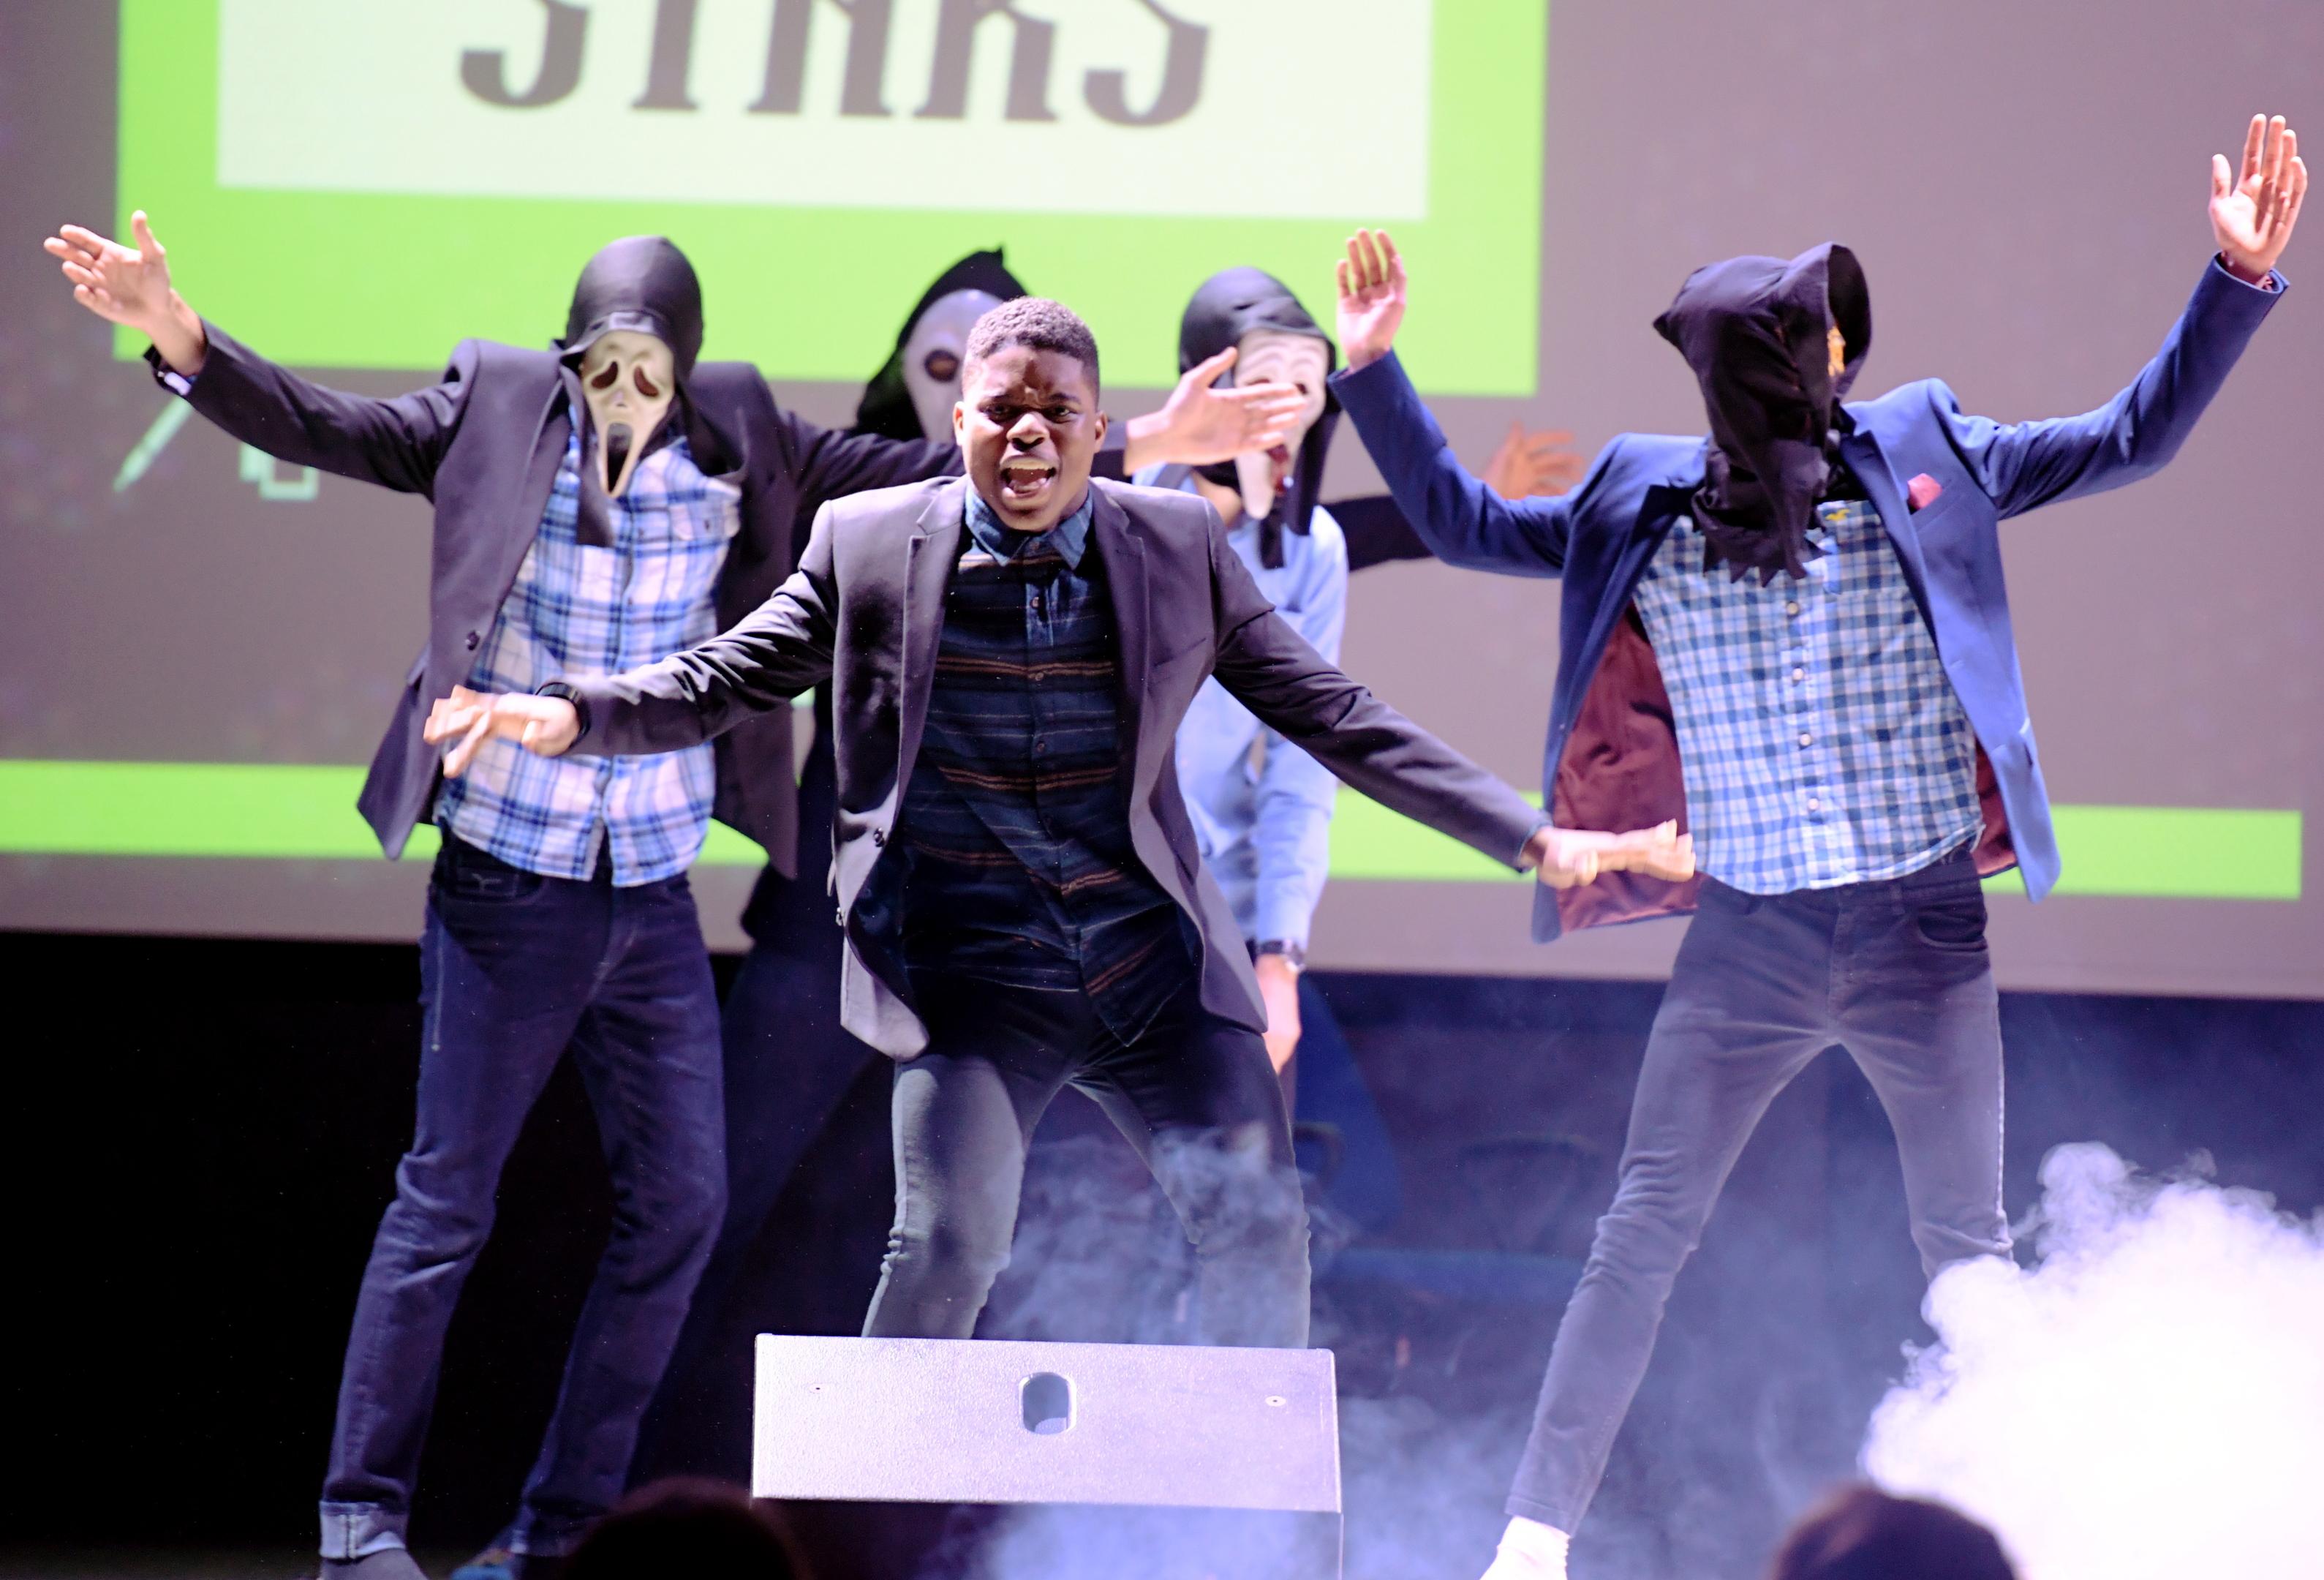 The final of Albyn School's LipSync battle. Bruno Stars perform onstage.